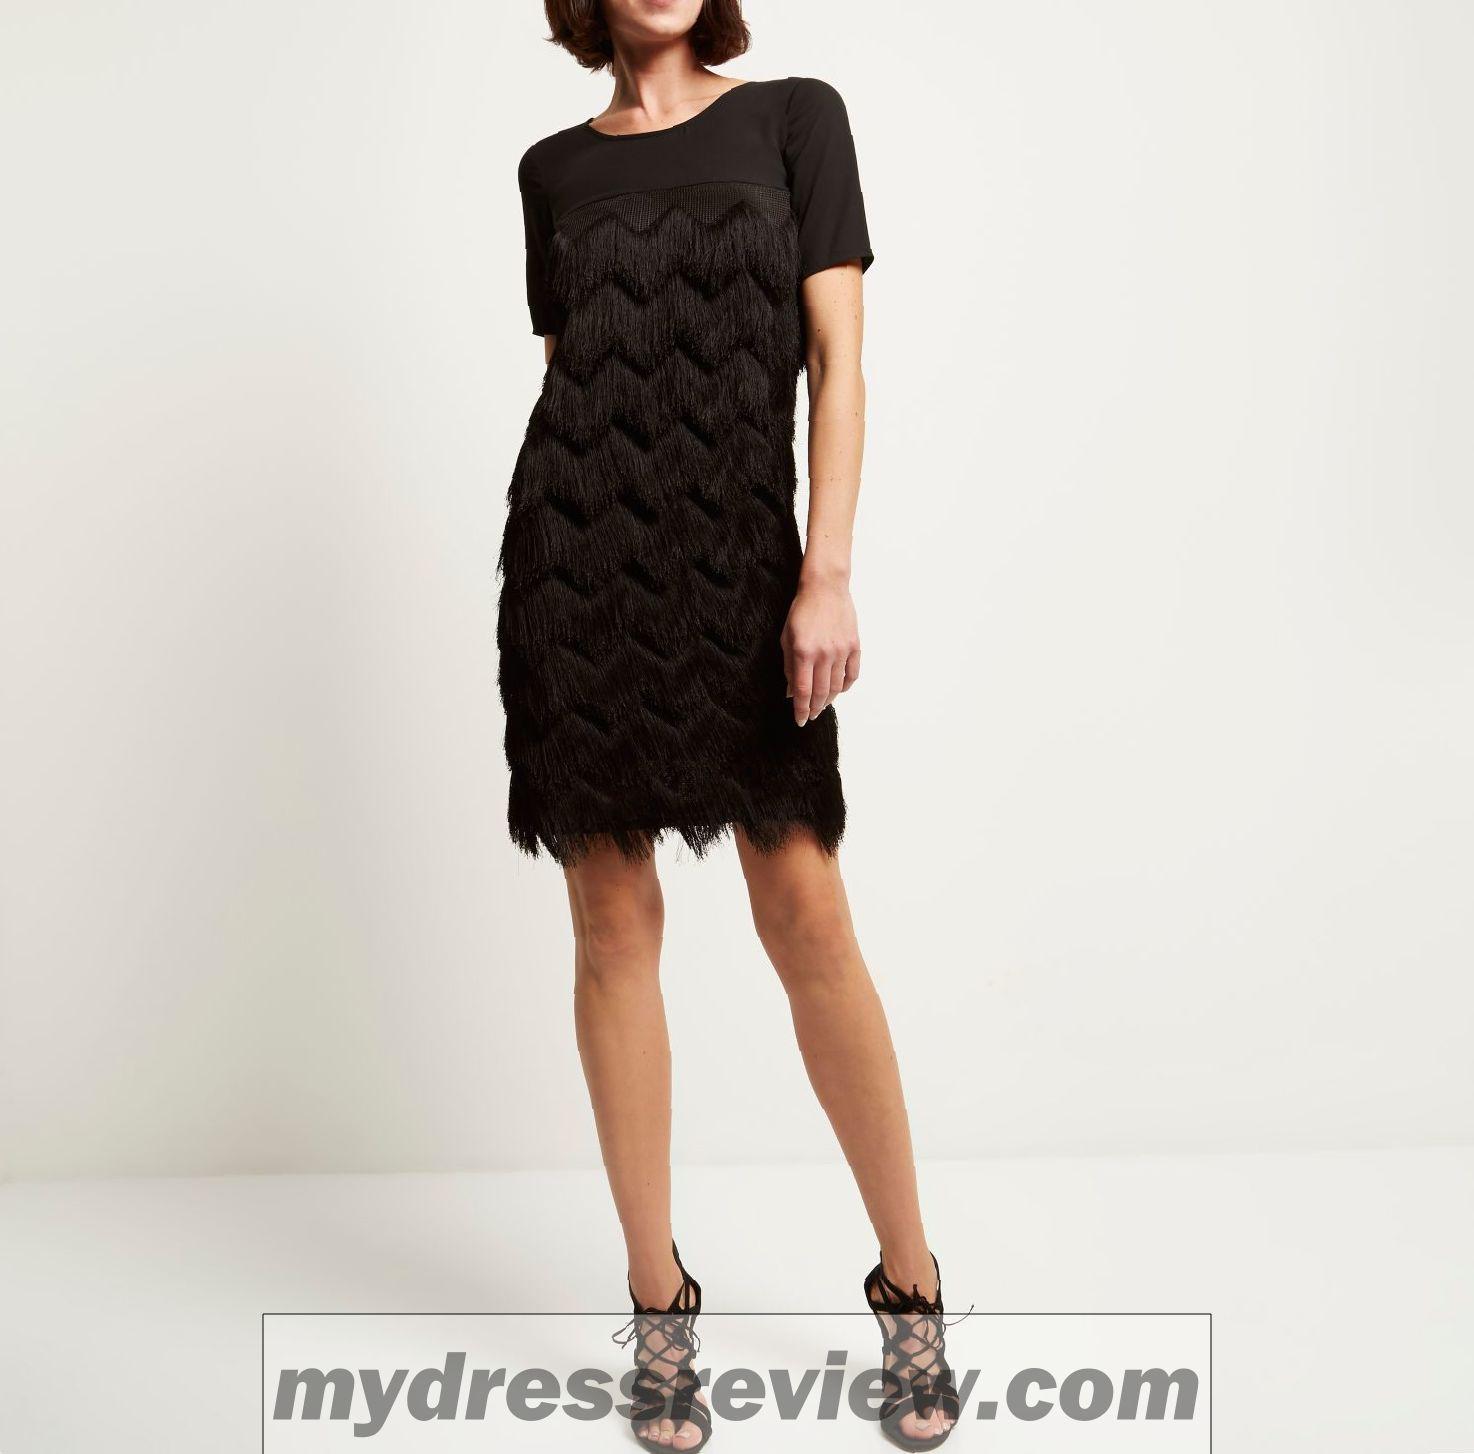 944a6ea02a0 Little Black Dress T Shirt River Island